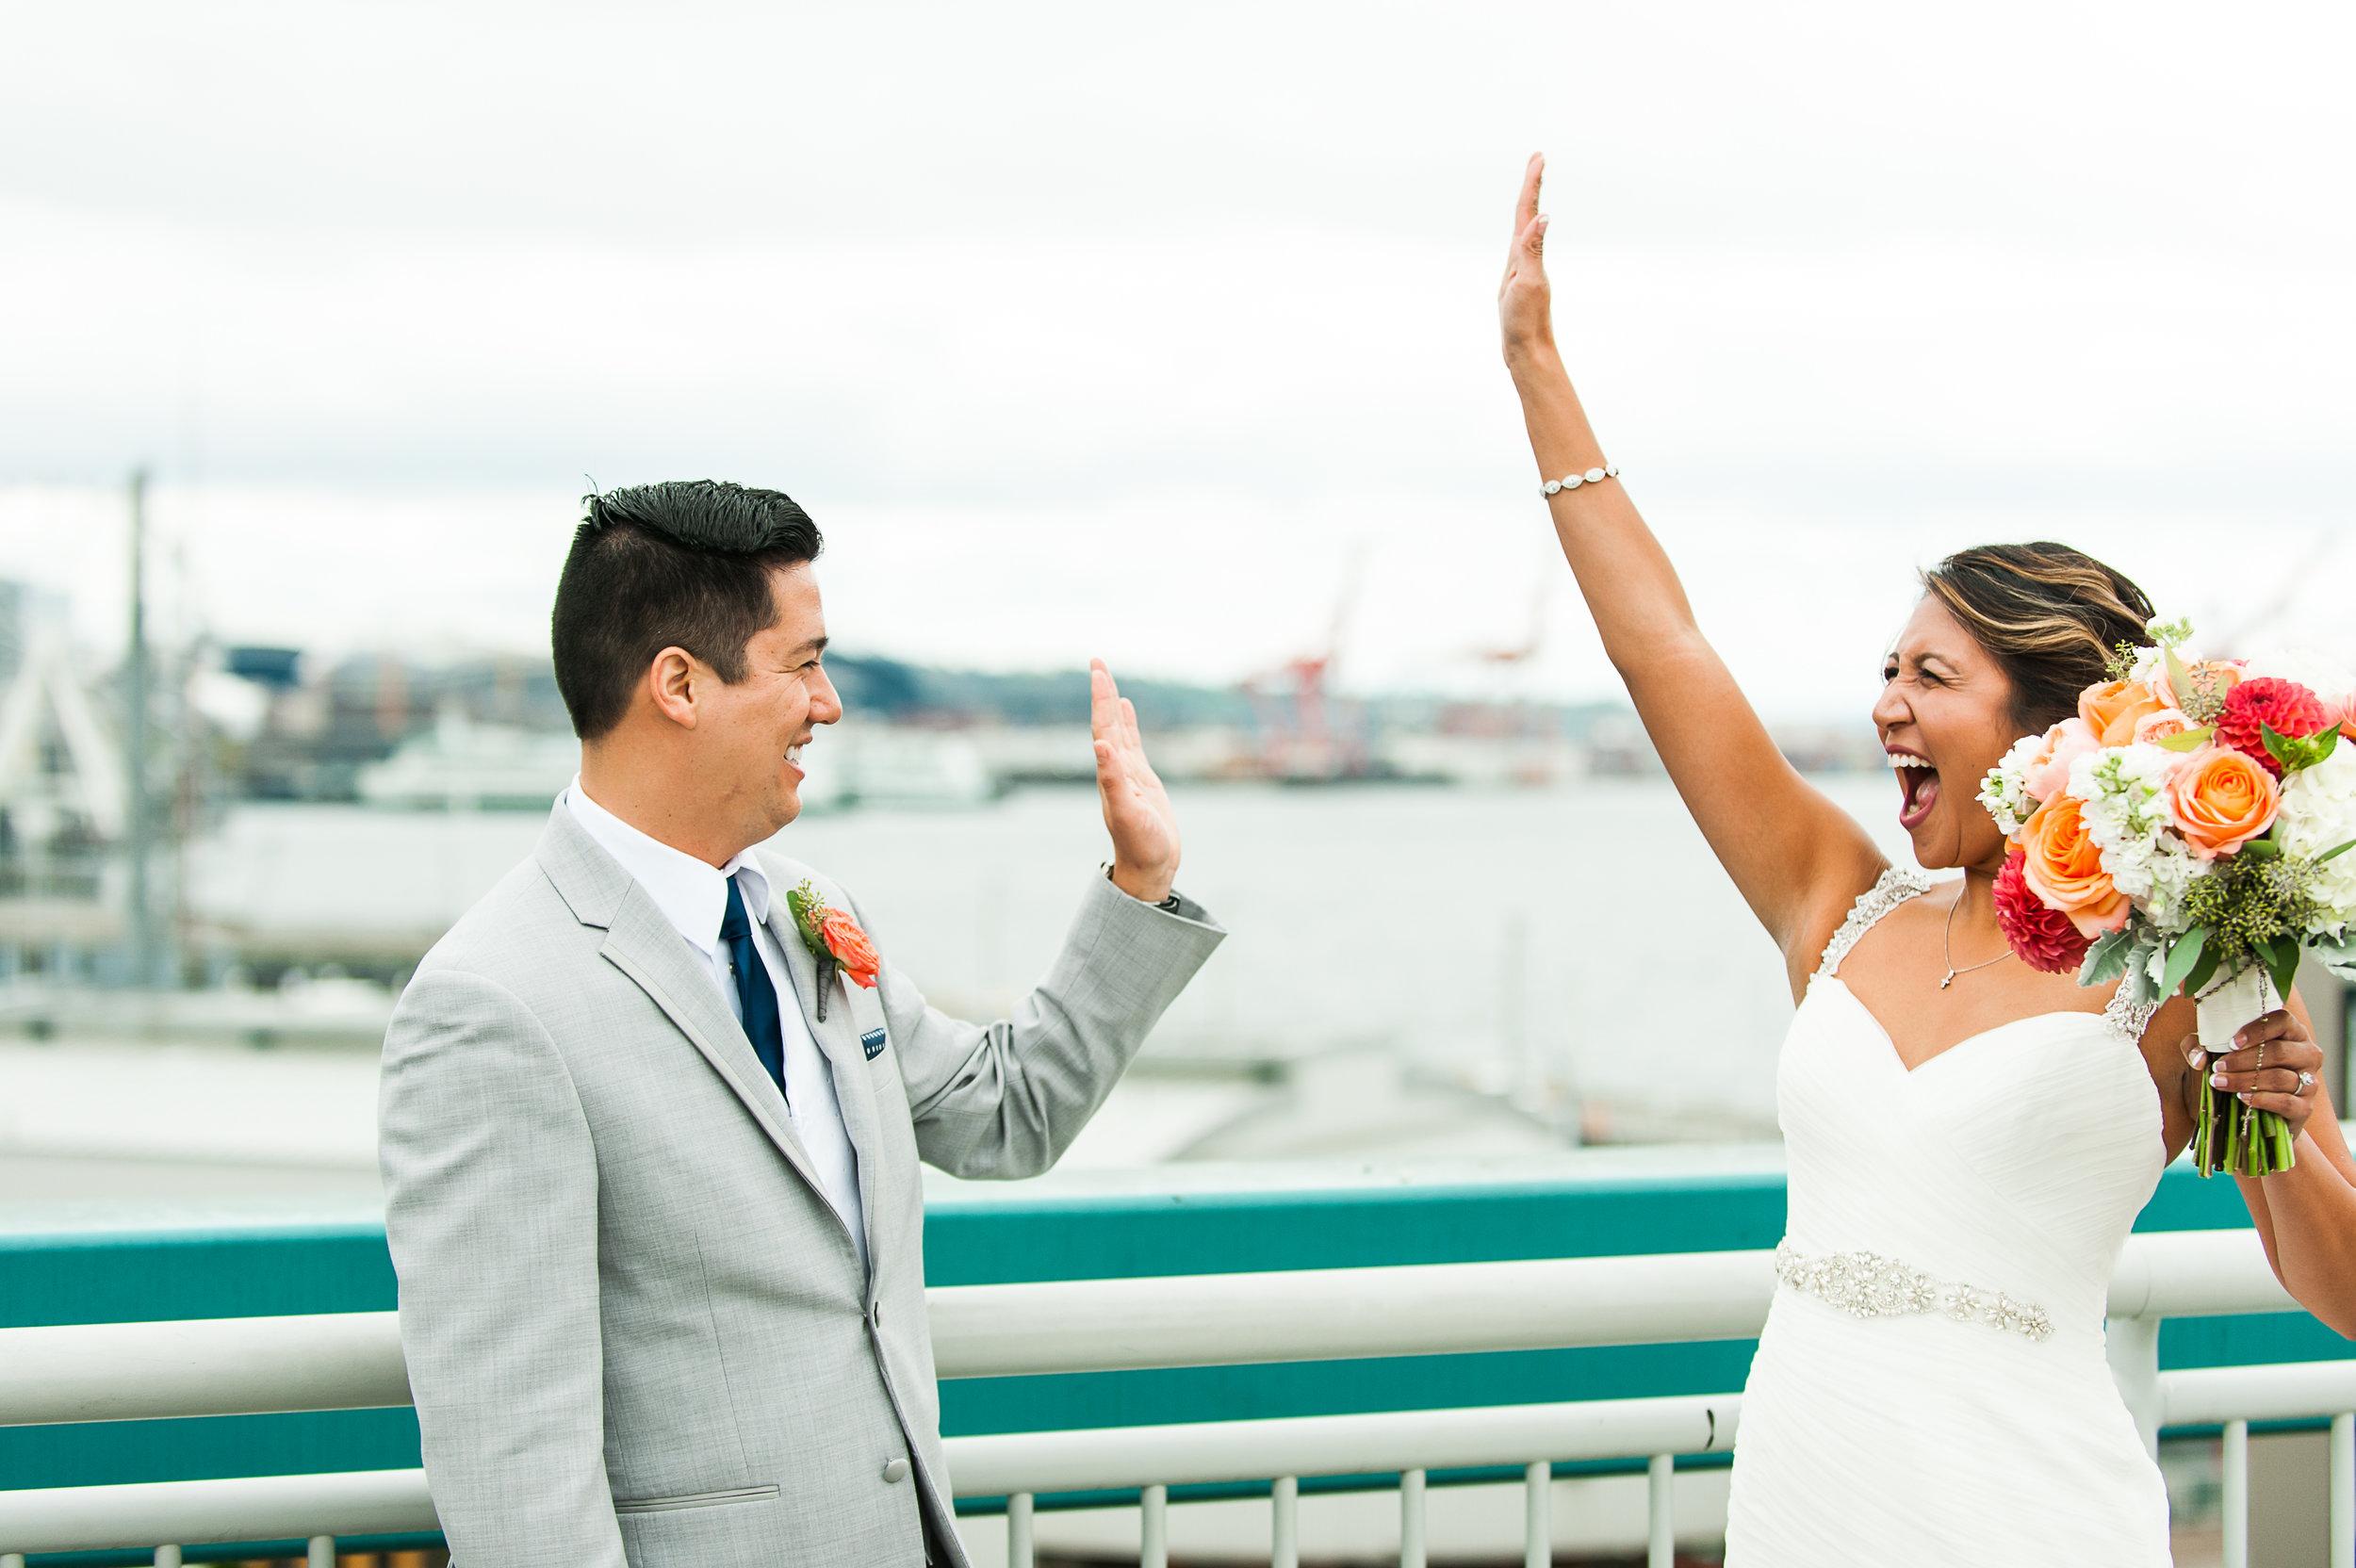 DJ-wedding-Van-Wyhe-Photography-109.jpg